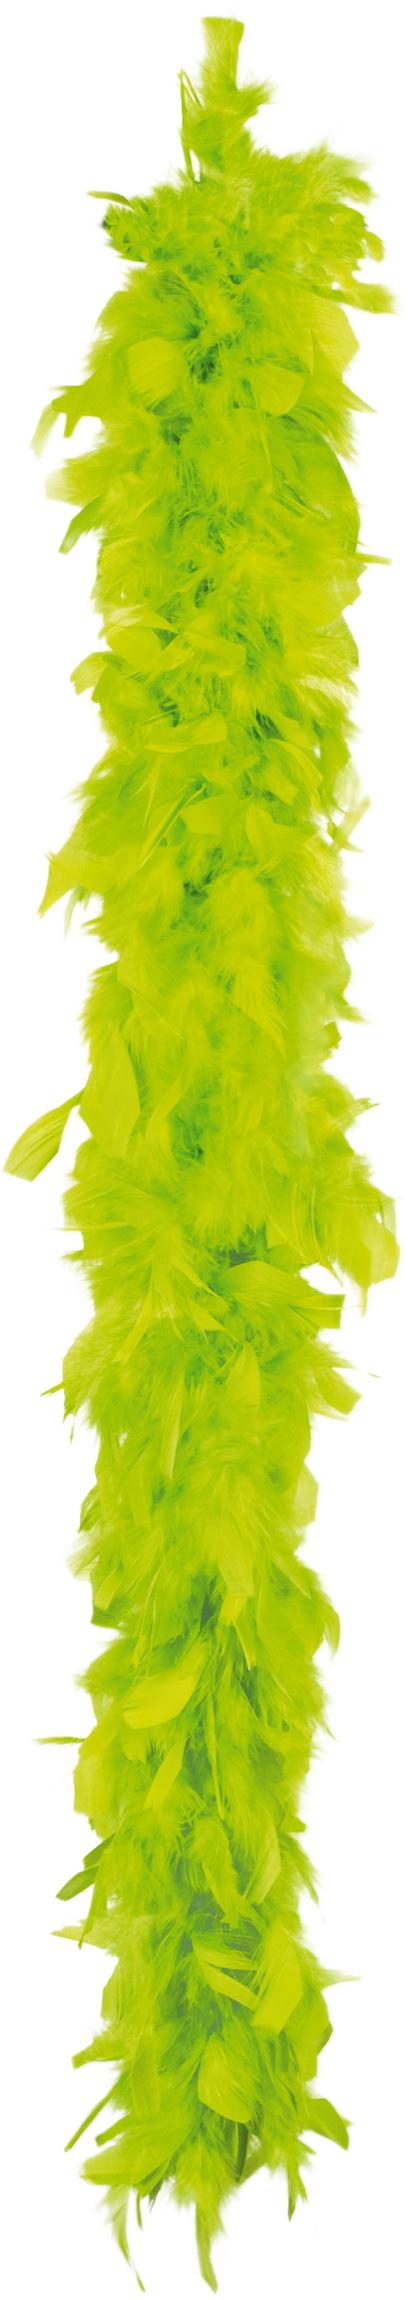 Photo du produit Boa vert fluo 50 g